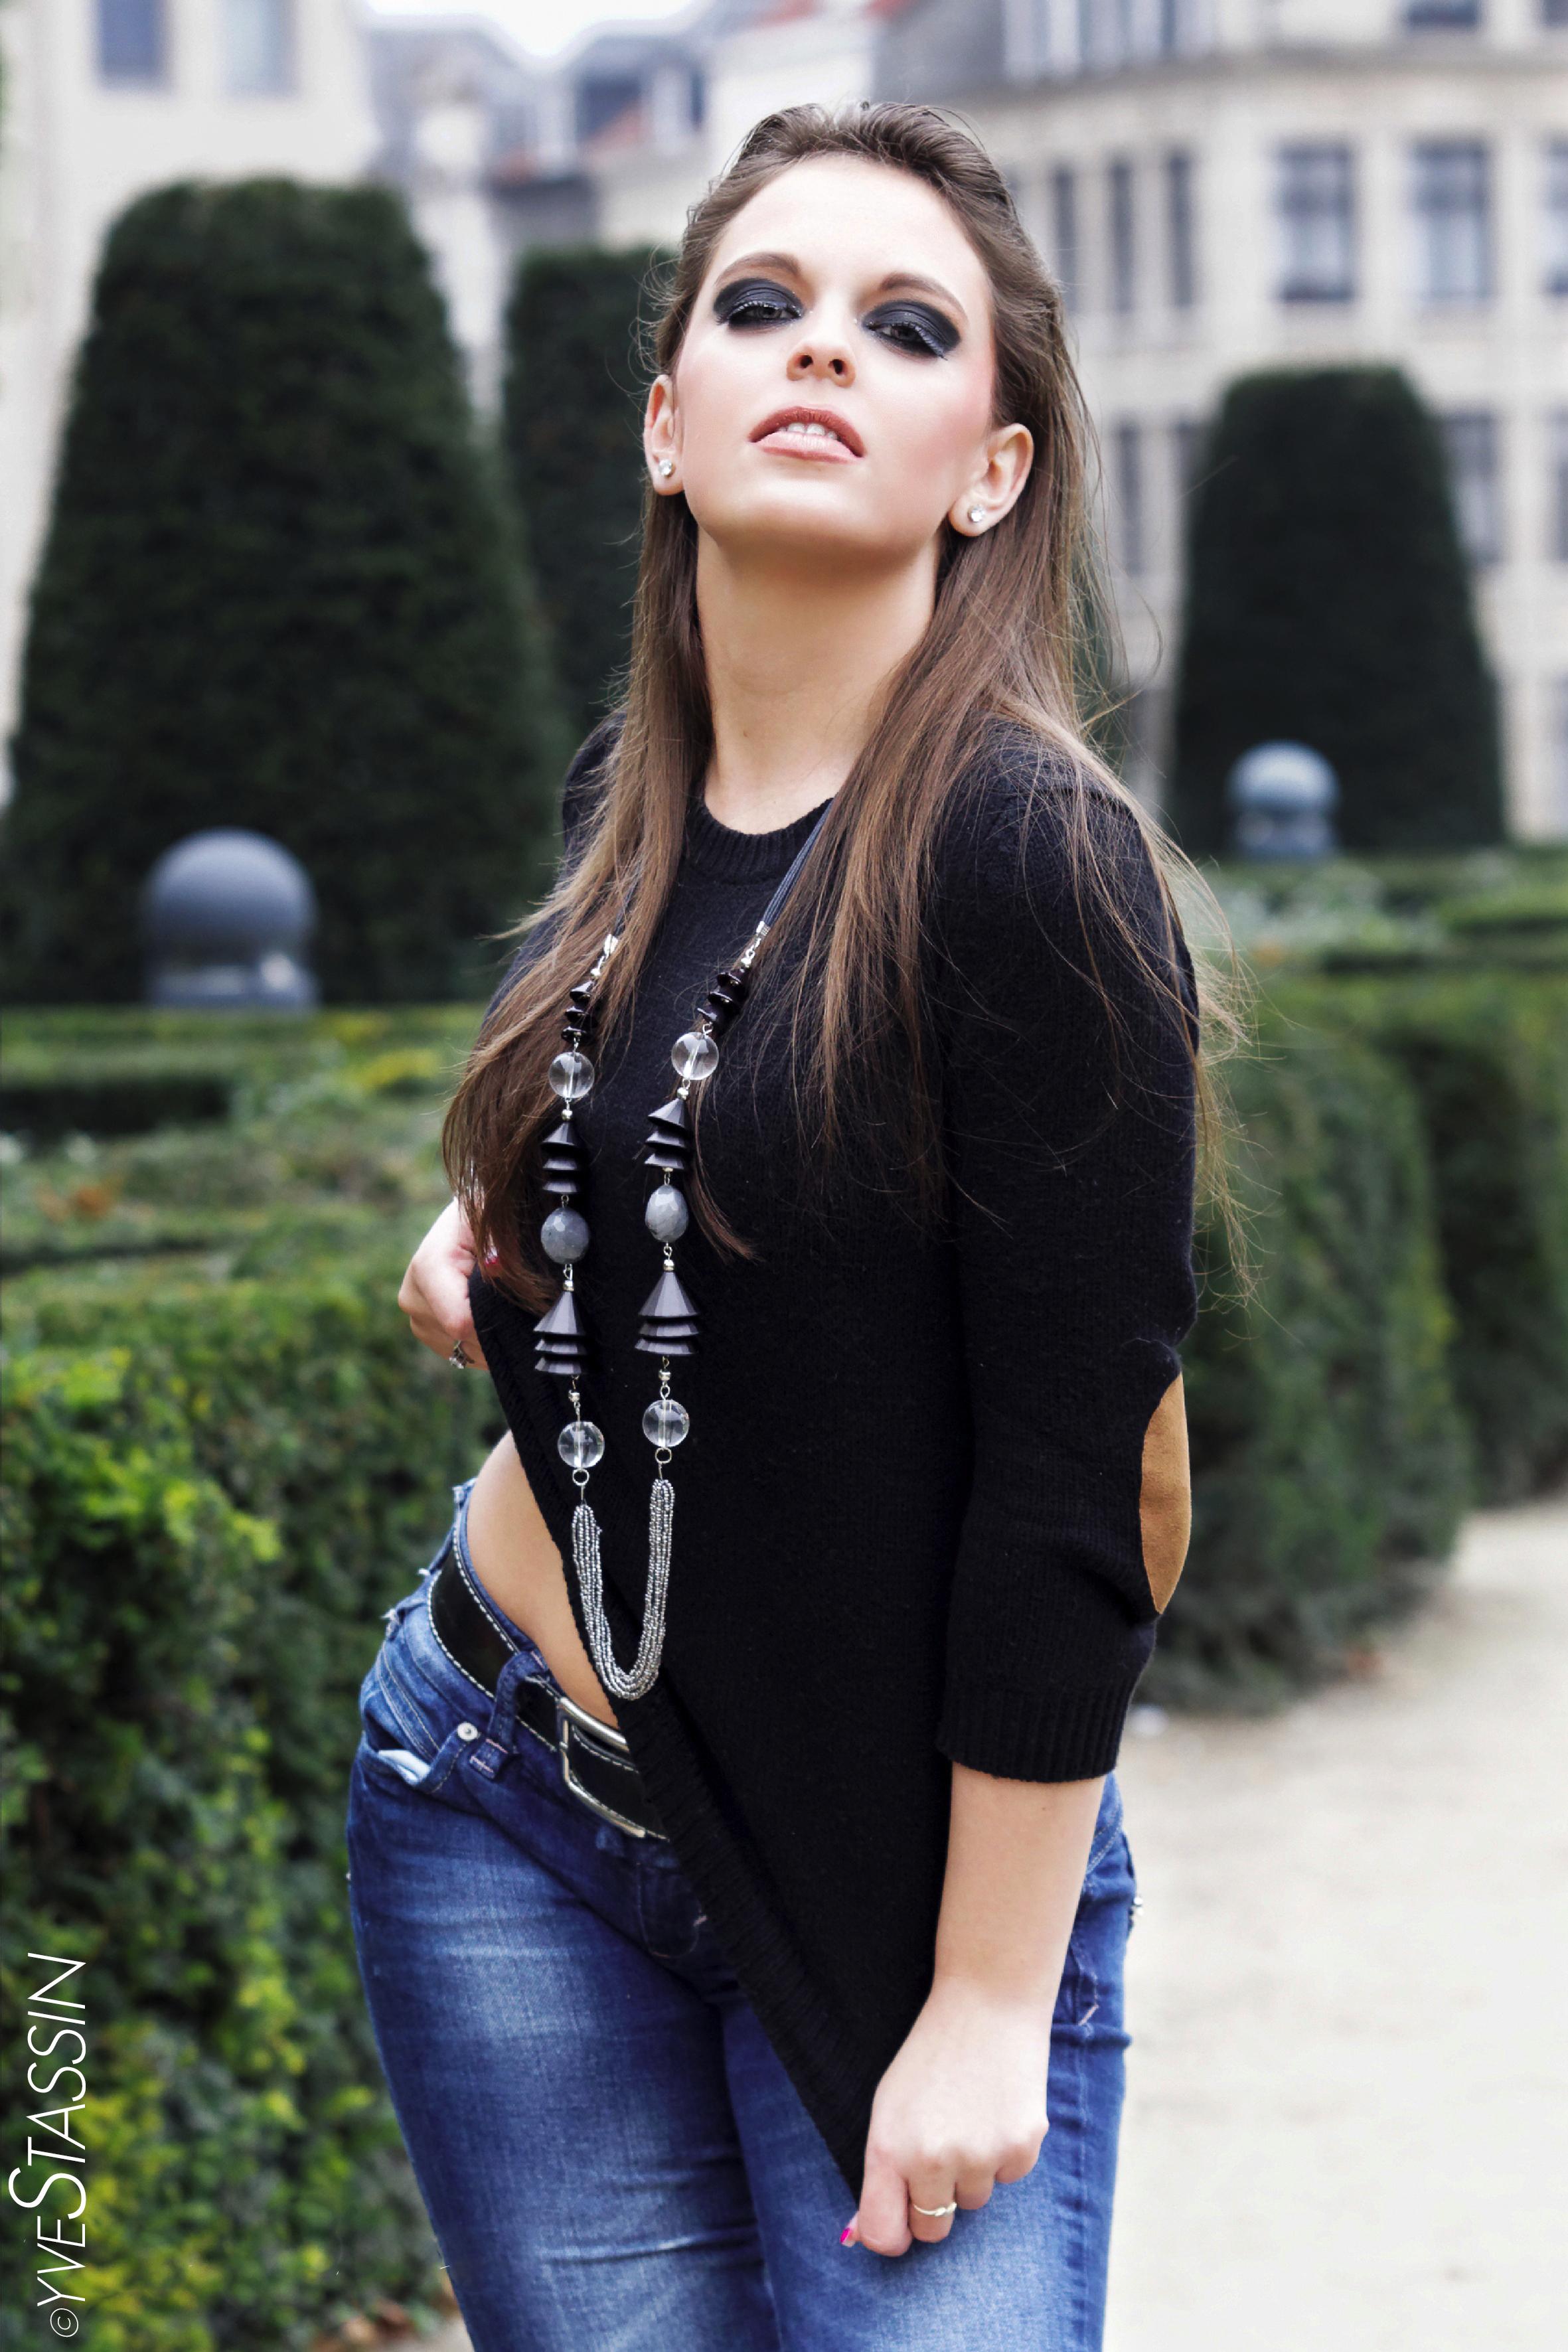 Aurélie Vanwilter par Yves Stassin